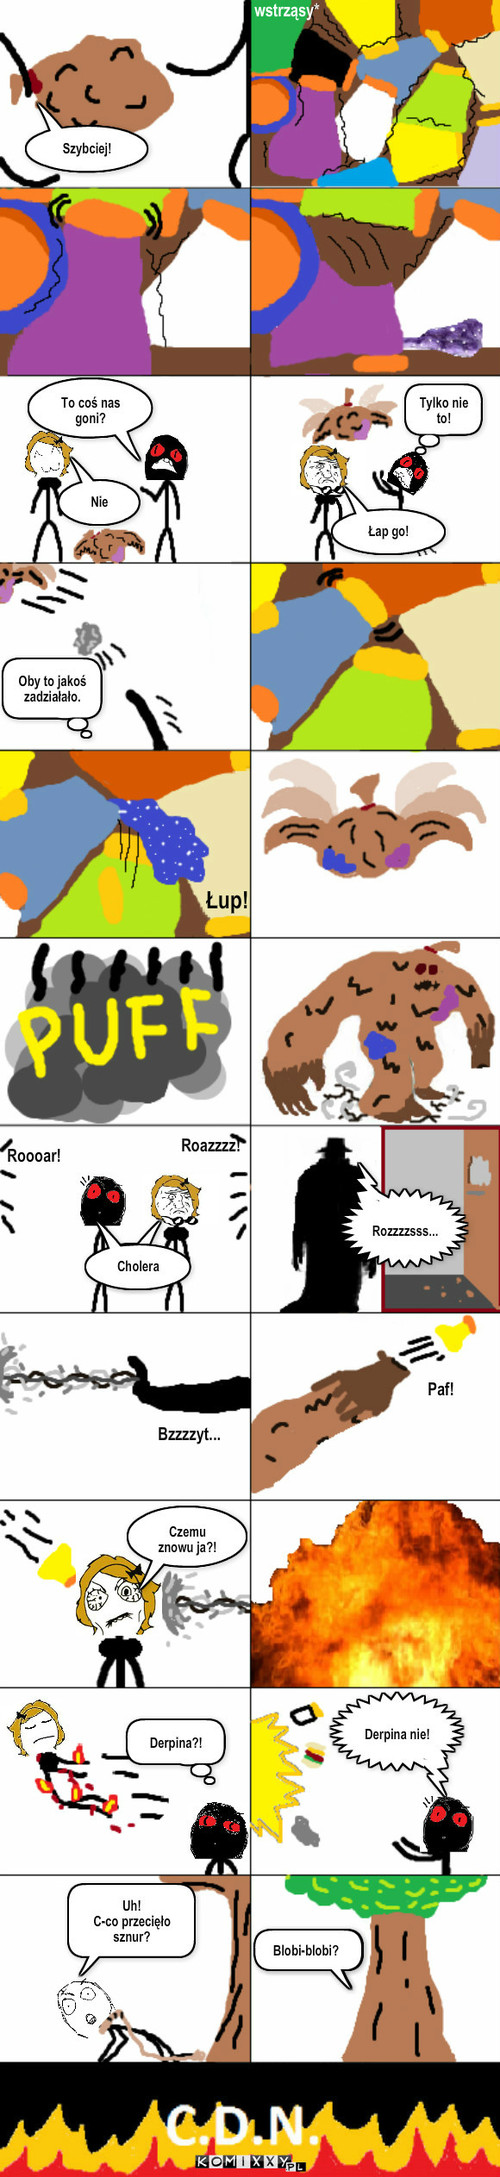 Świat Saggaru s2 #8 – Blobi-blobi?